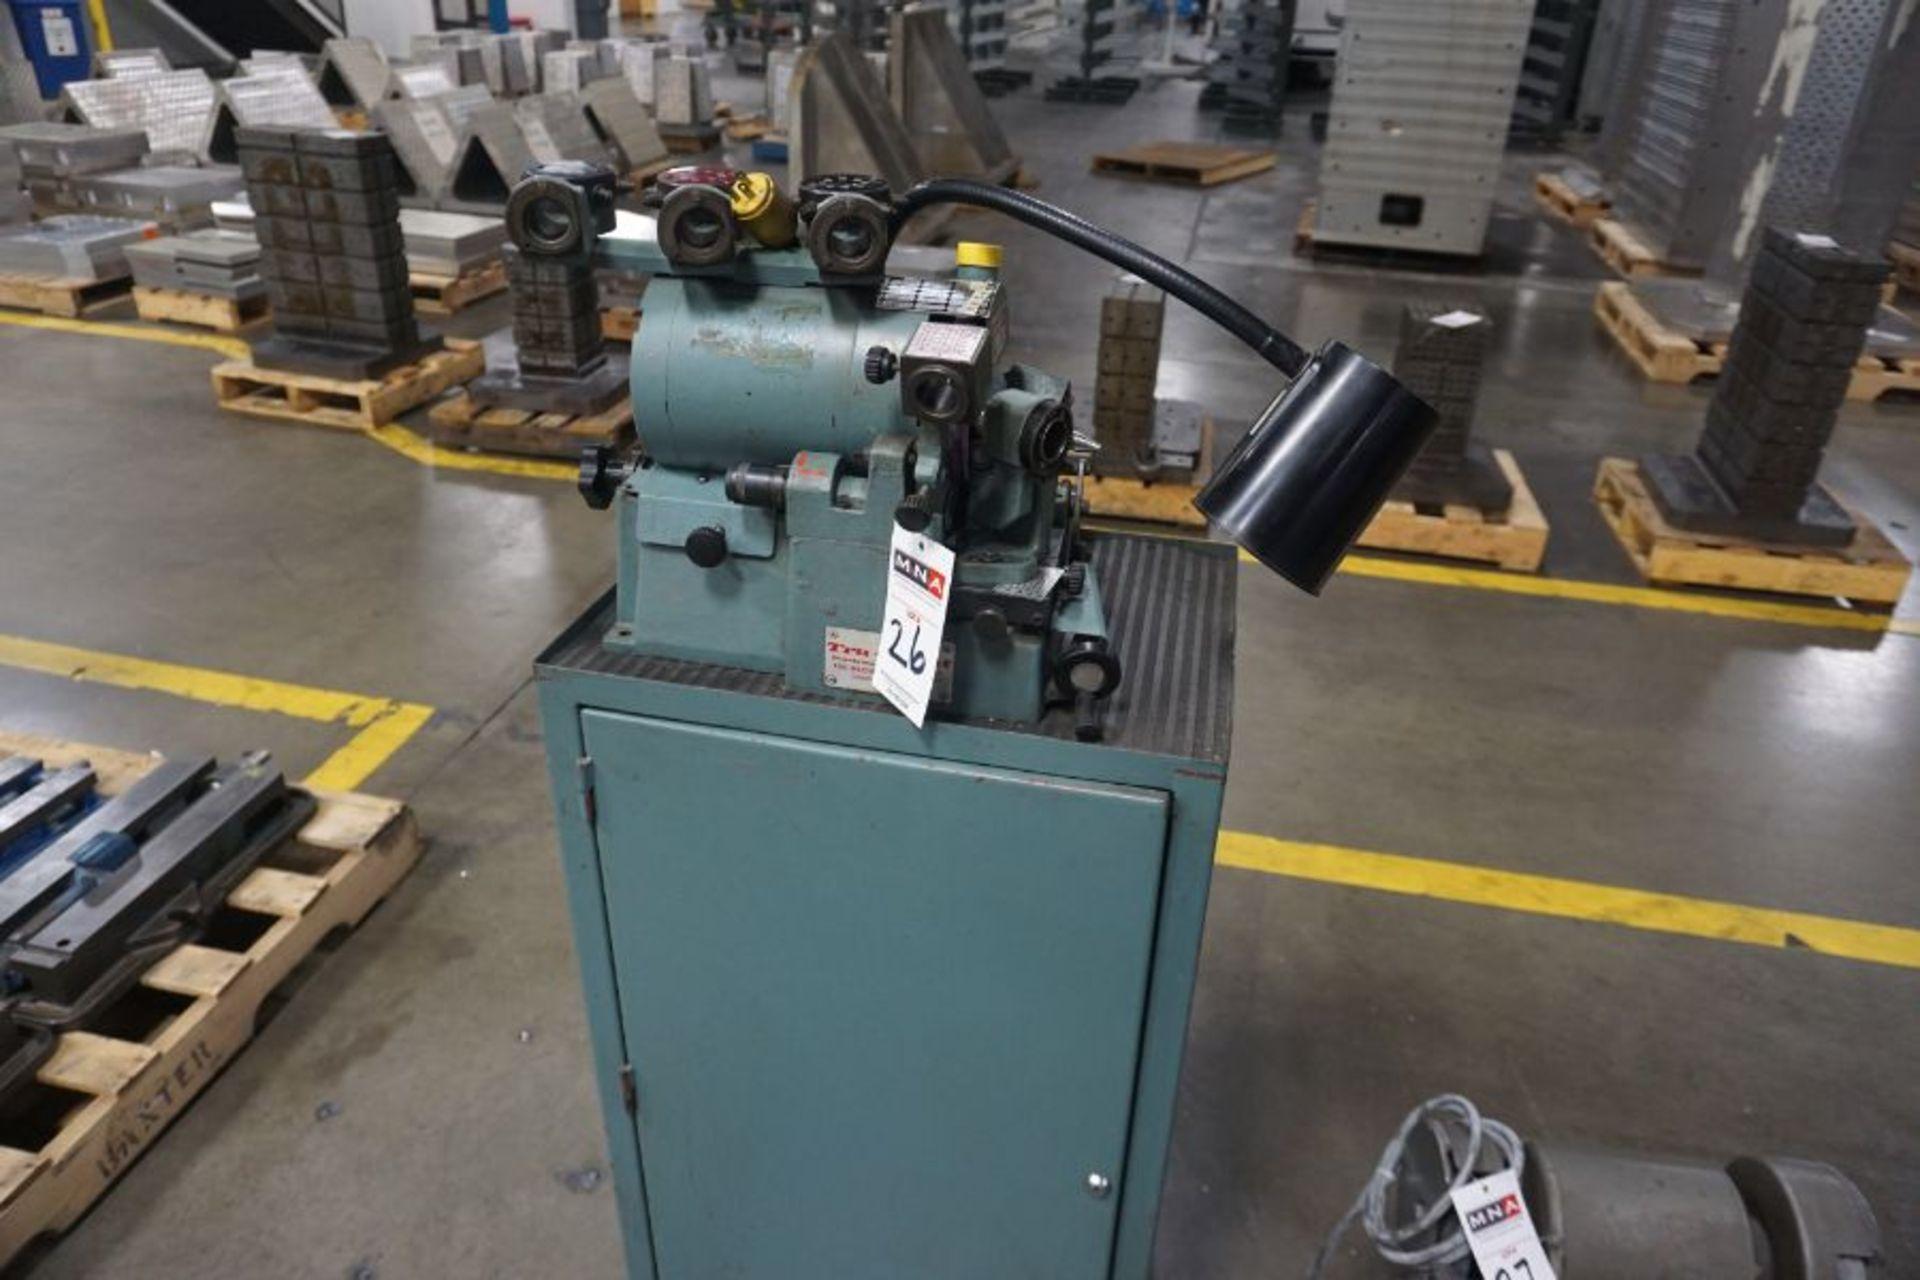 Tru Point Drill Sharpener - Image 2 of 4